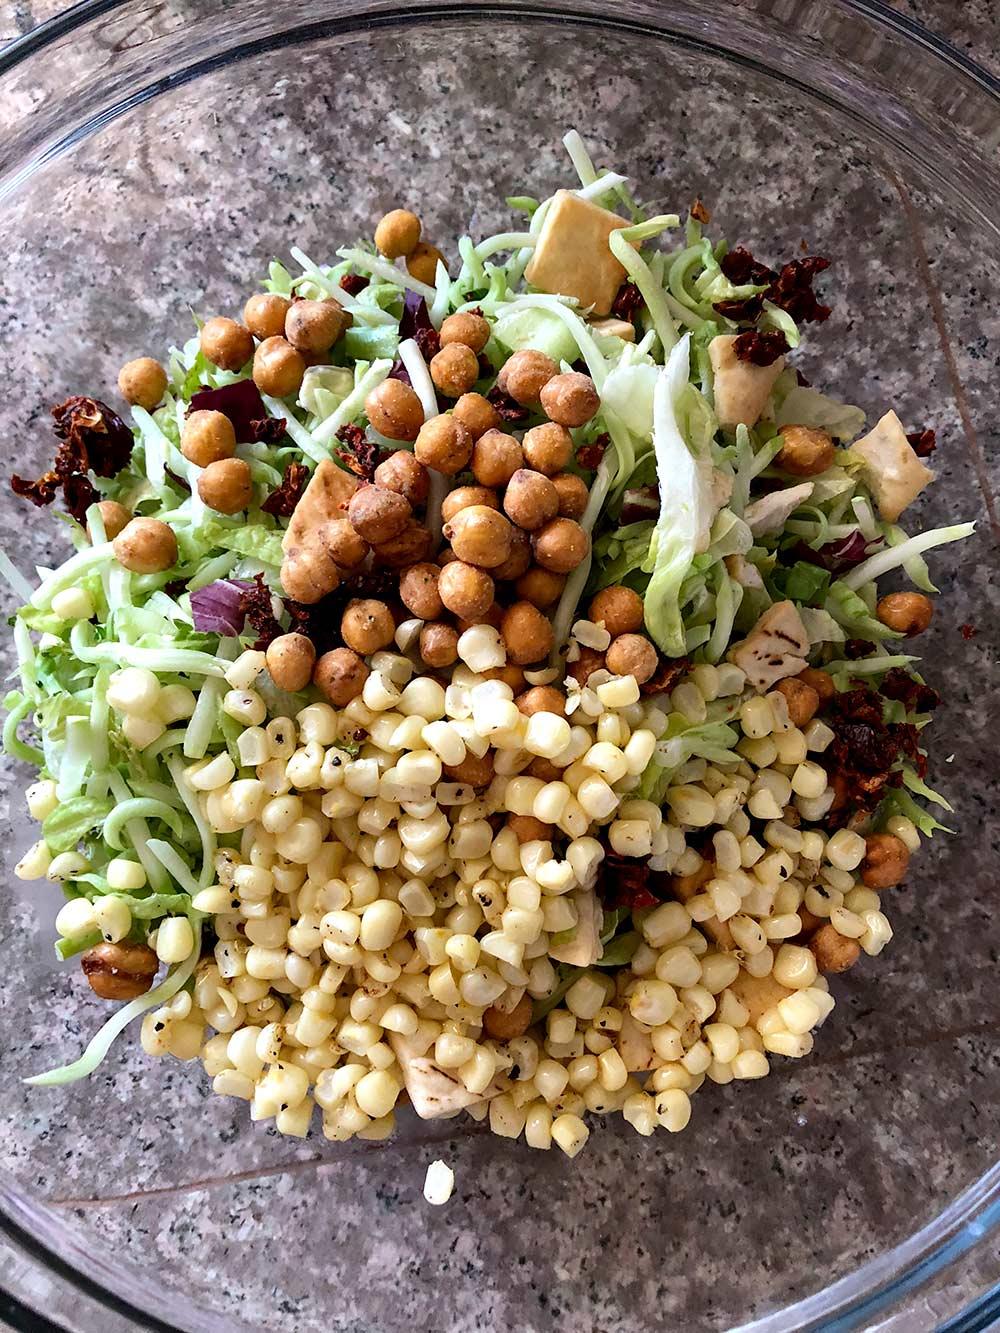 trader joes mediterranean style salad kit